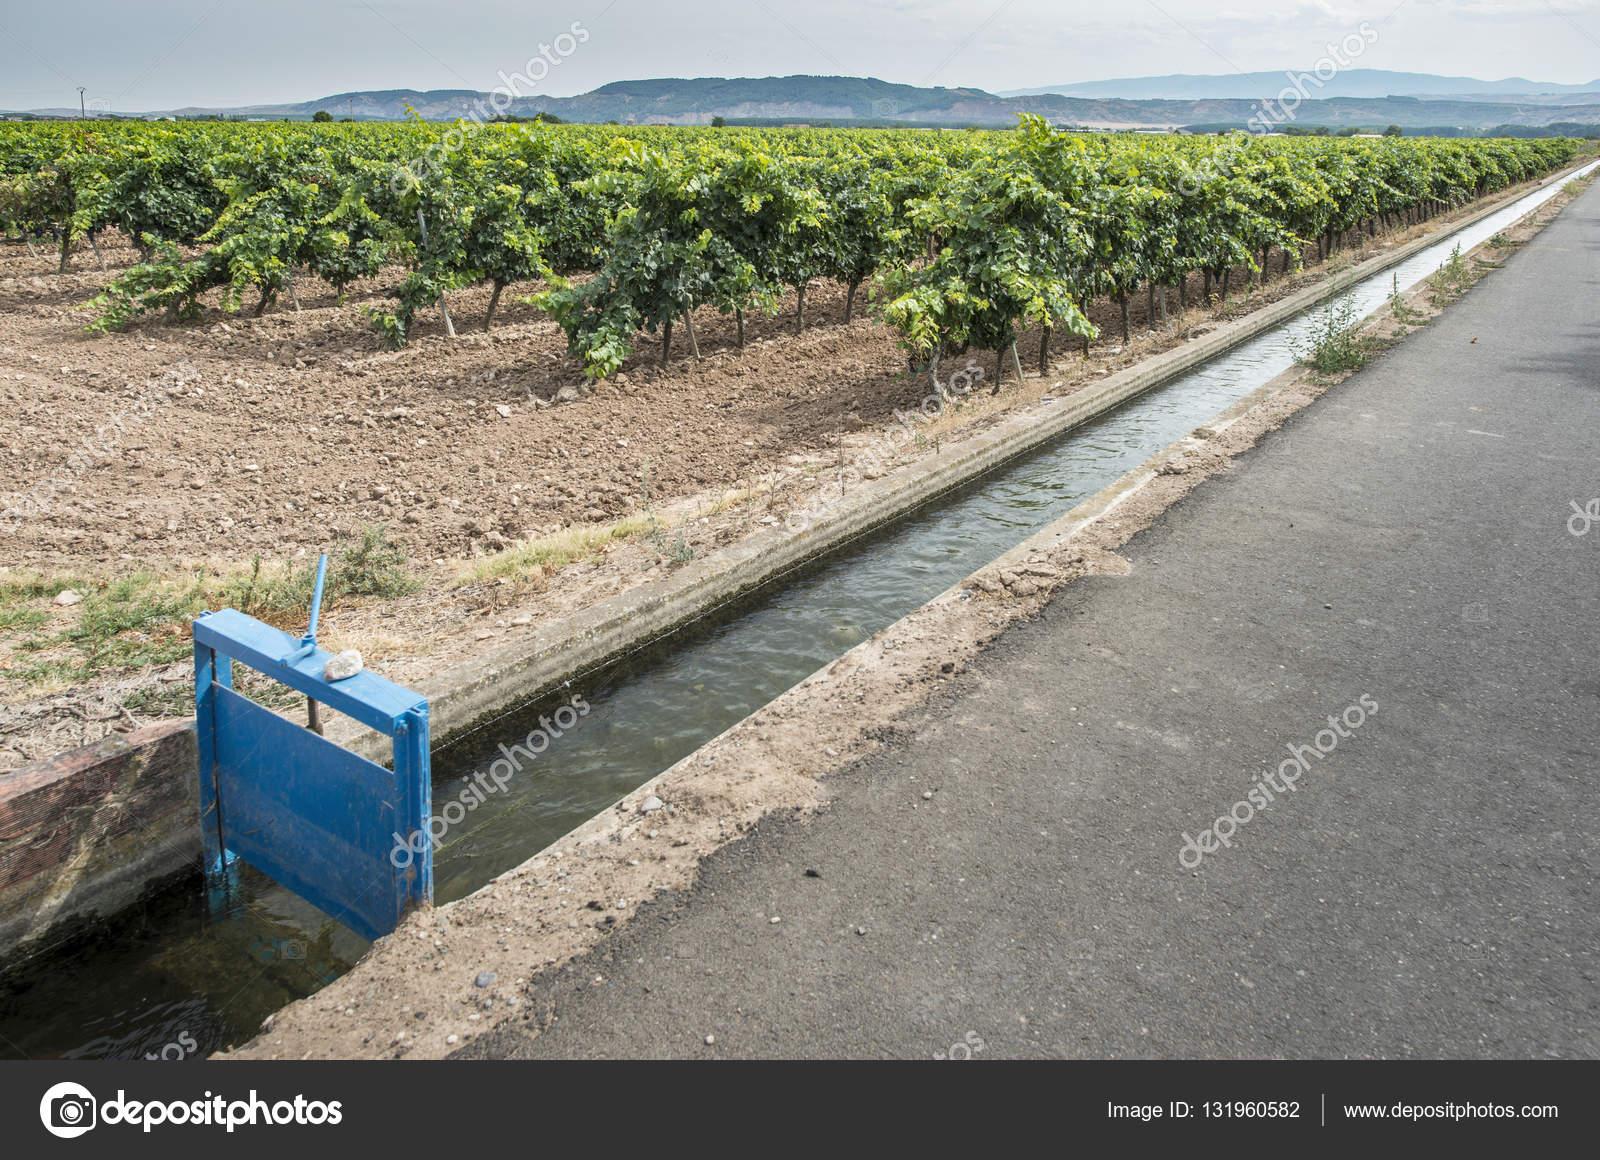 1204 : Marie la morte  Depositphotos_131960582-stock-photo-vineyards-and-close-up-irrigation